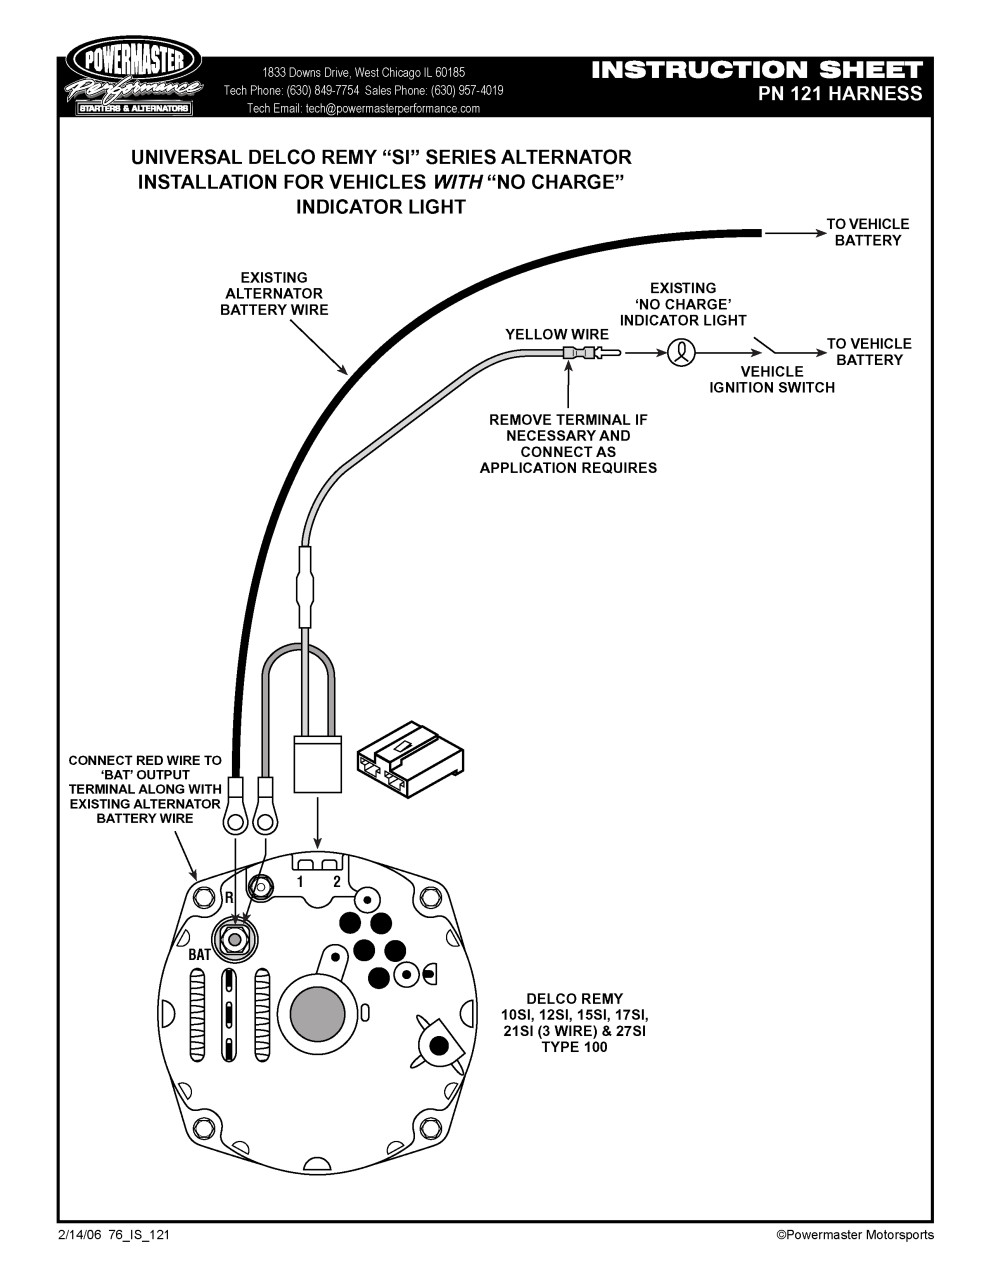 Gm Alternator Wiring : alternator, wiring, Alternator, Wiring, Diagram, -1995, Cherokee, Interior, Begeboy, Source